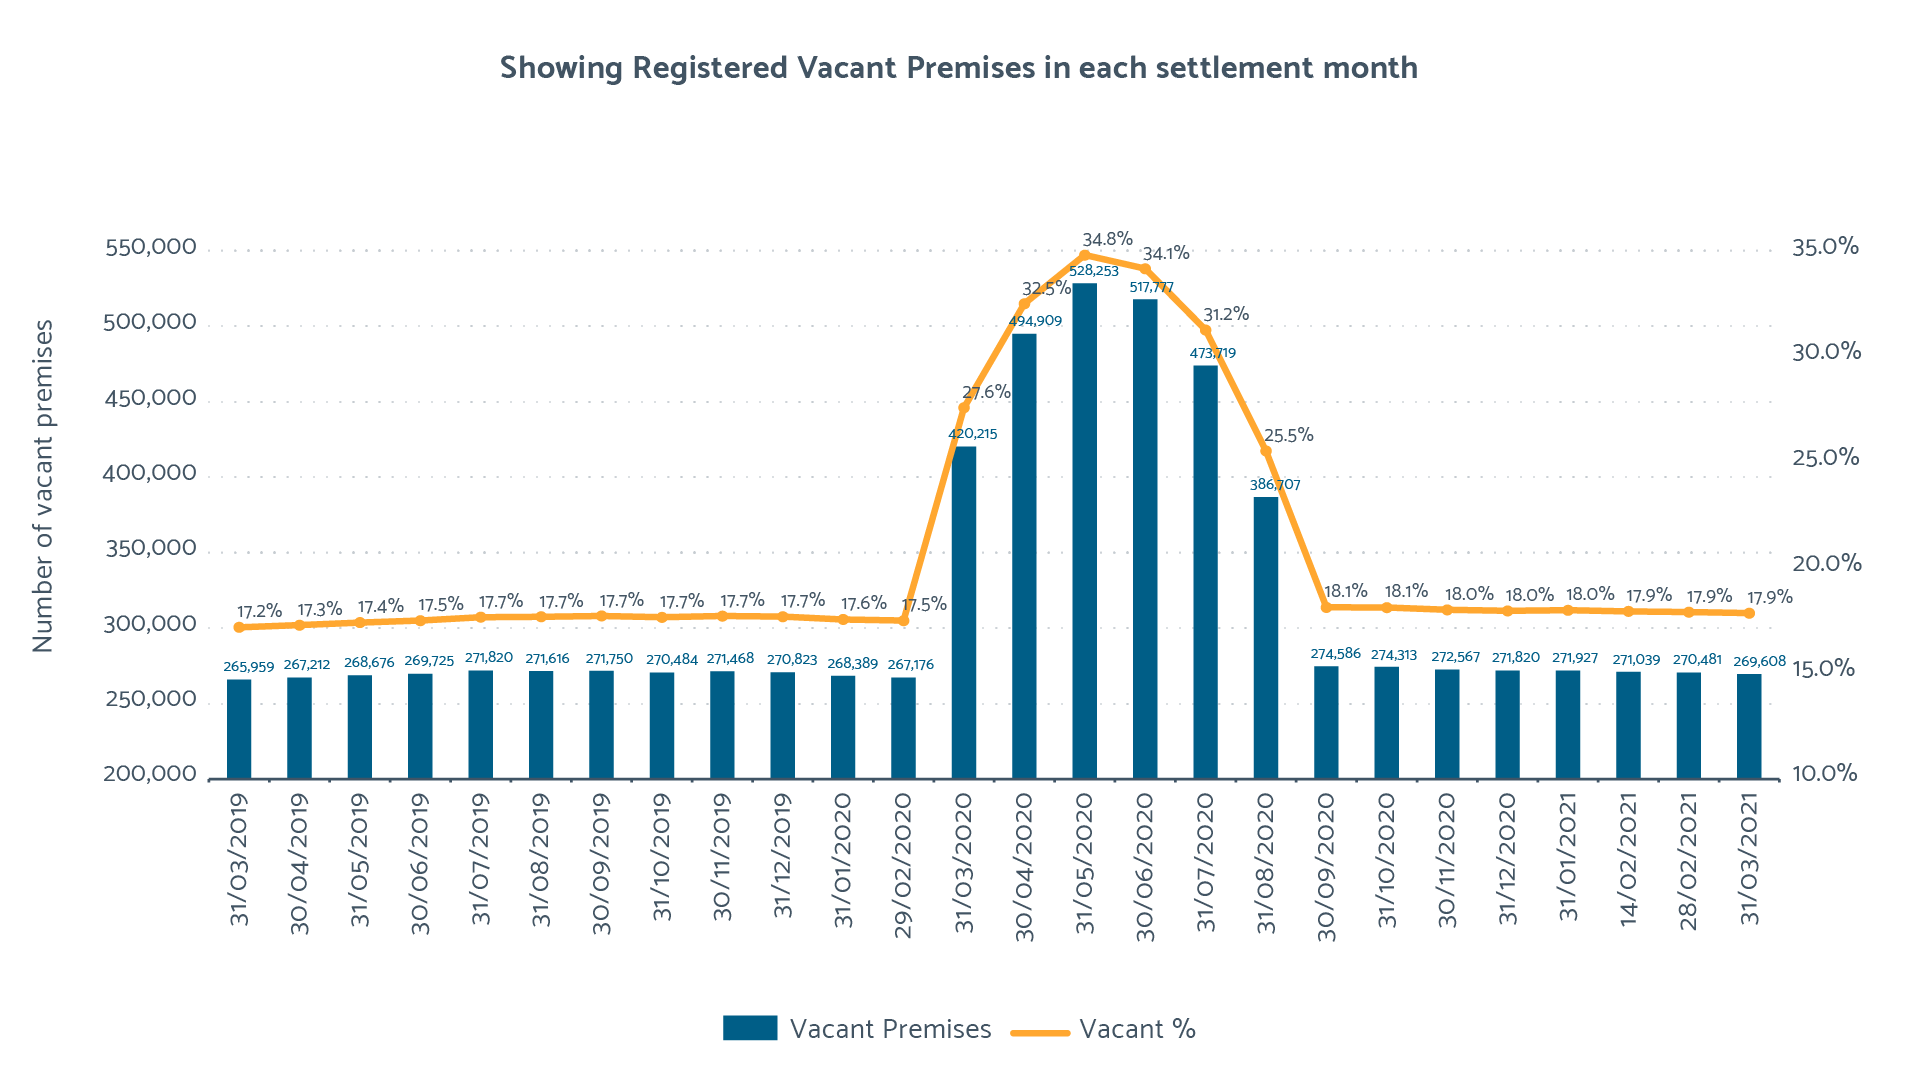 2019/20 Vacant Premises chart